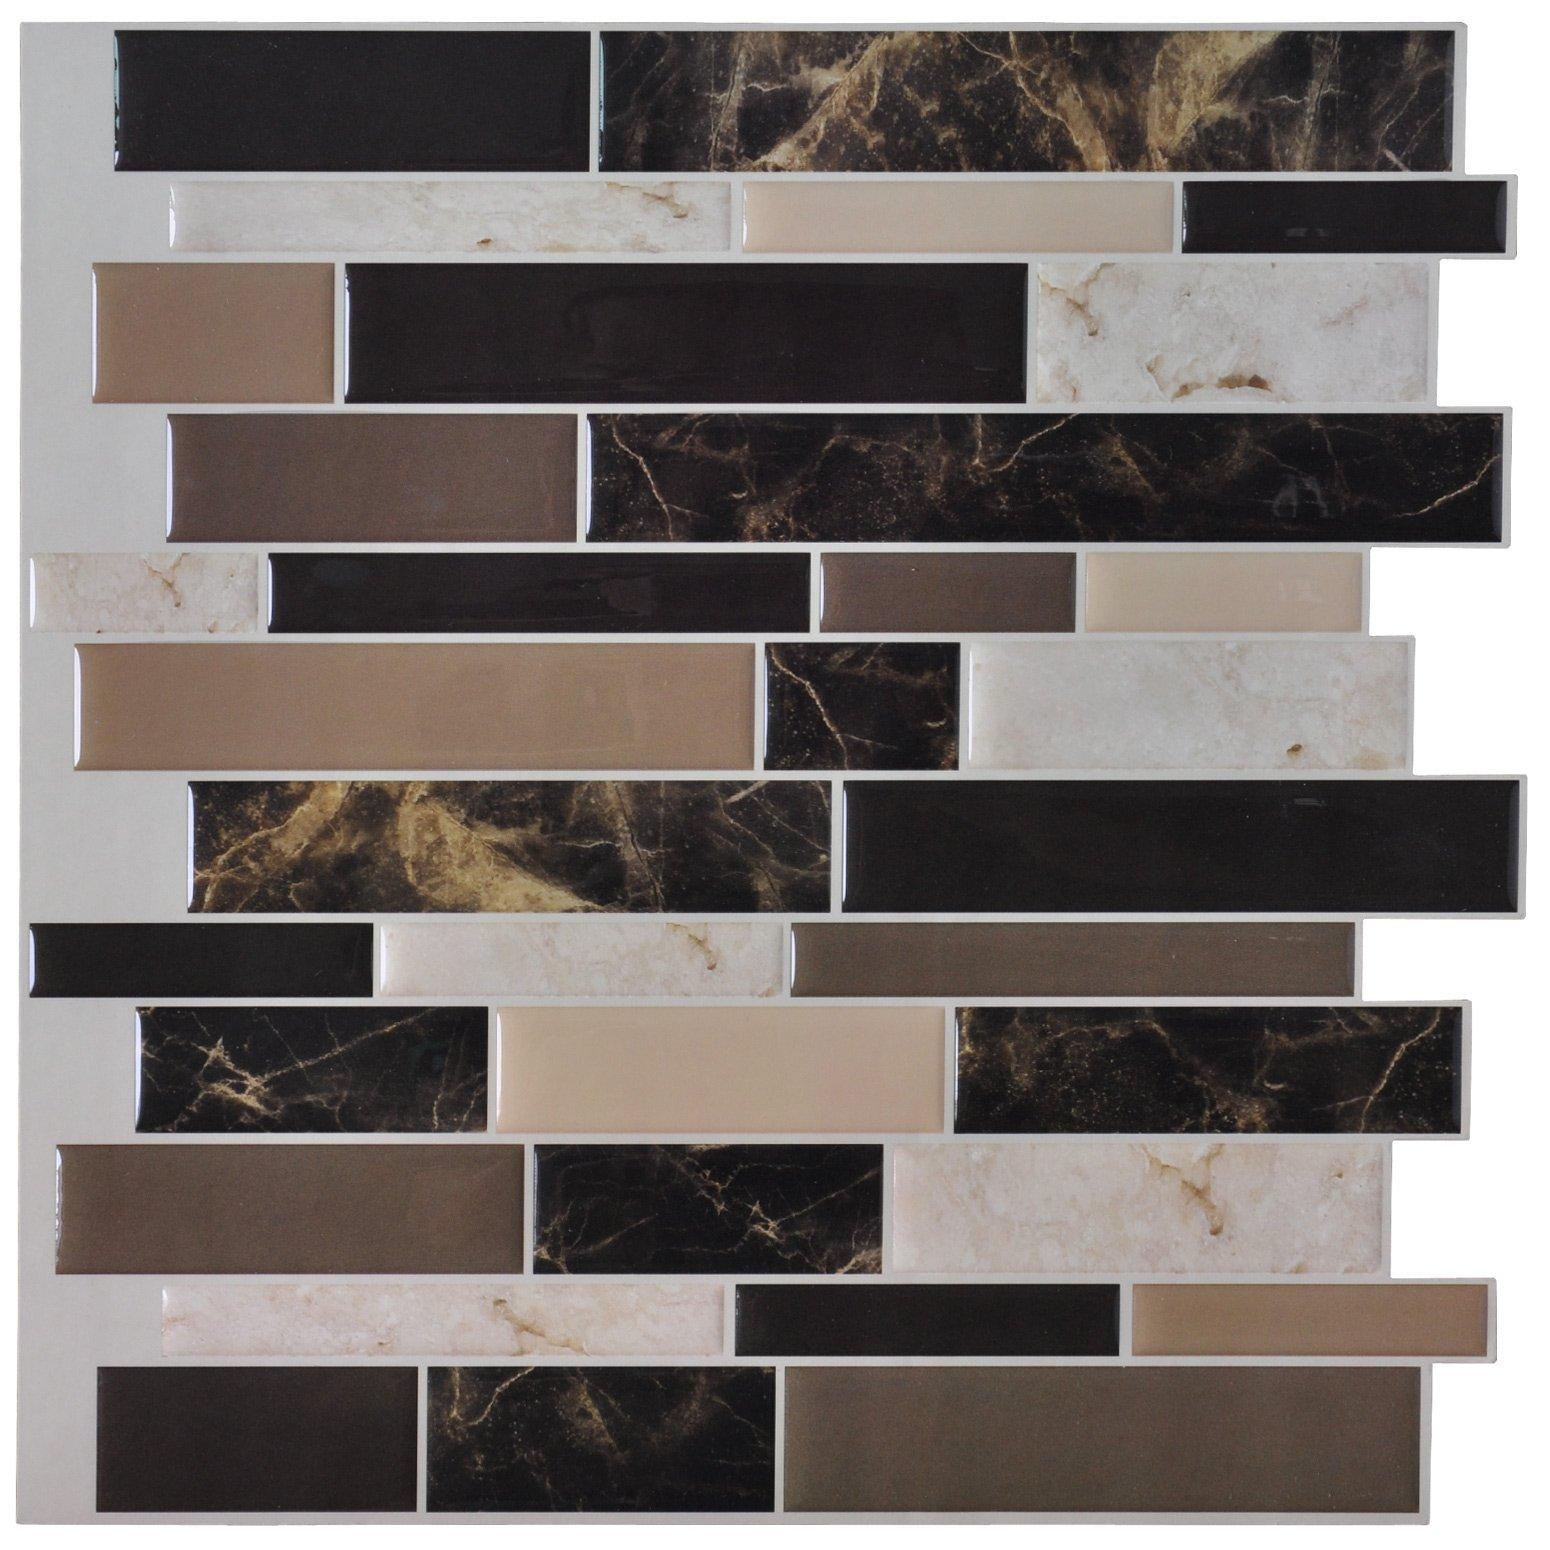 Amazon Com Art3d 6 Pack Peel And Stick Vinyl Sticker Kitchen Backsplash Tiles 12 X 12 Marble Design Home Improvement